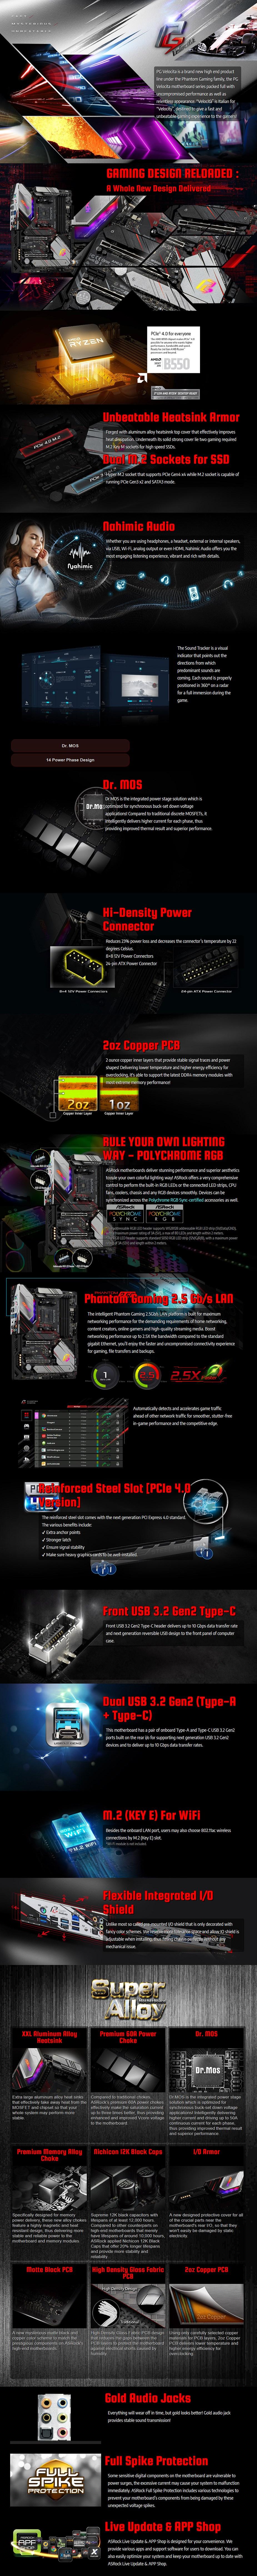 ASRock B550 PG Velocita AM4 ATX Motherboard - Overview 1